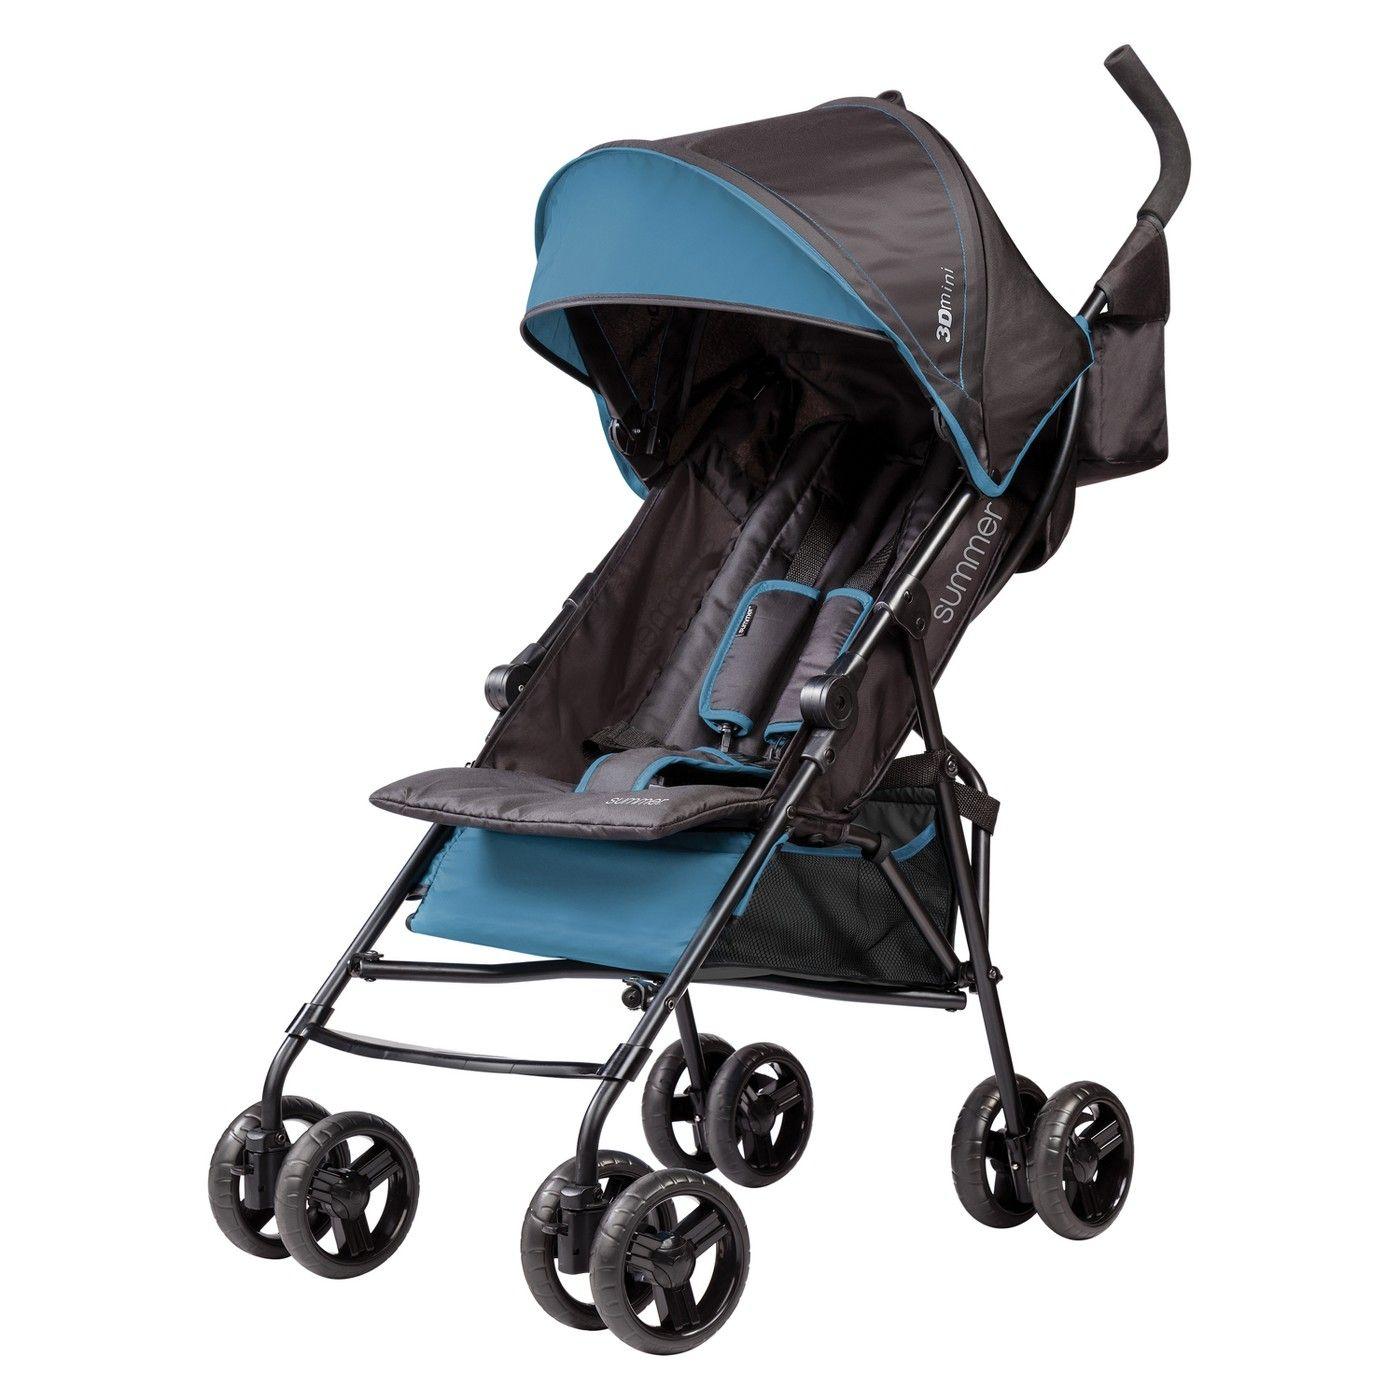 Summer 3Dmini Convenience Stroller - Blue | Stroller, Baby ...